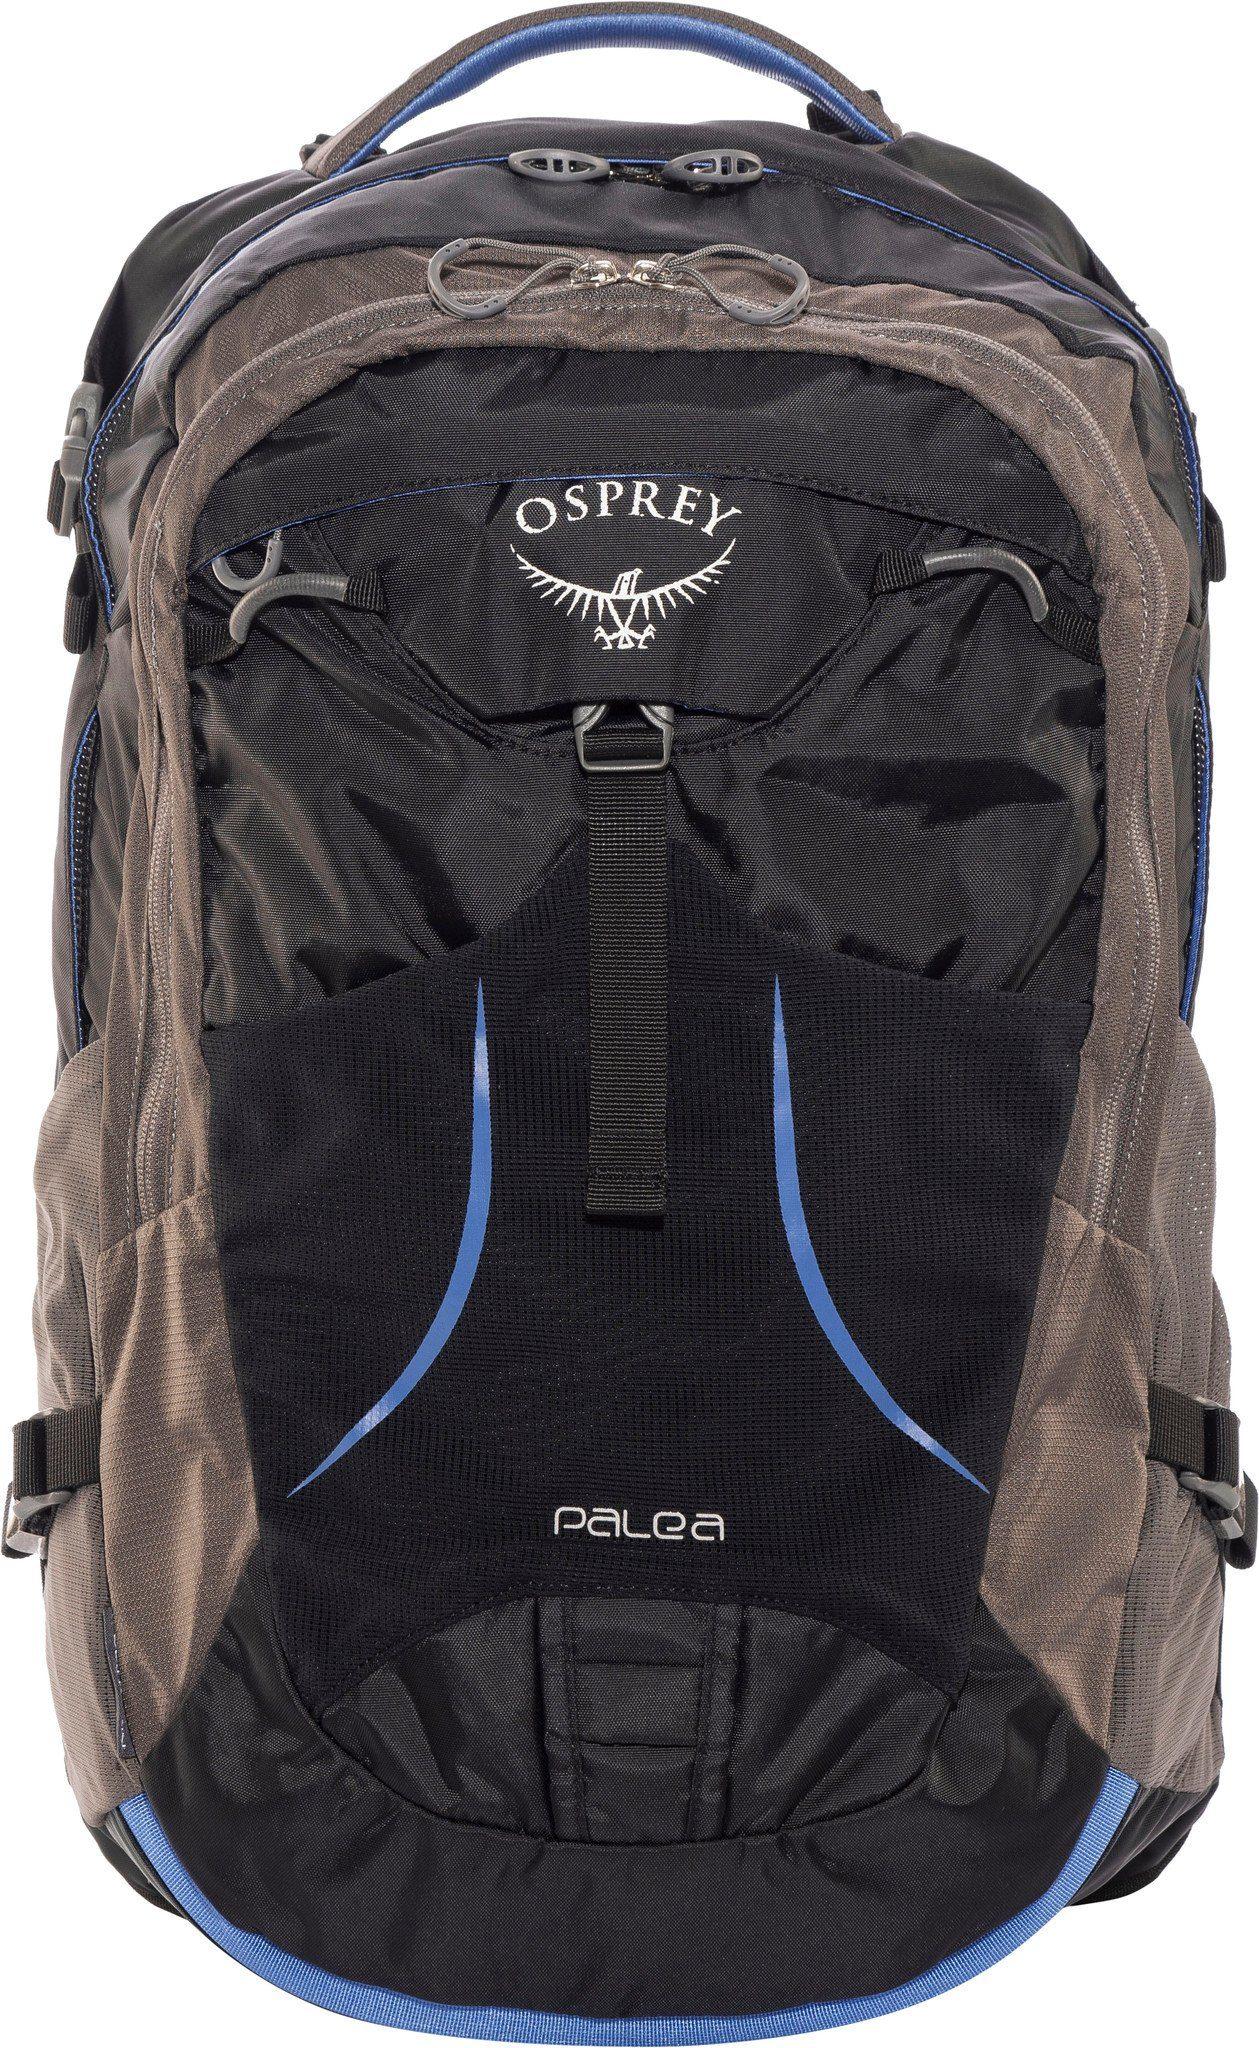 Osprey Wanderrucksack »Palea 26 Backpack«